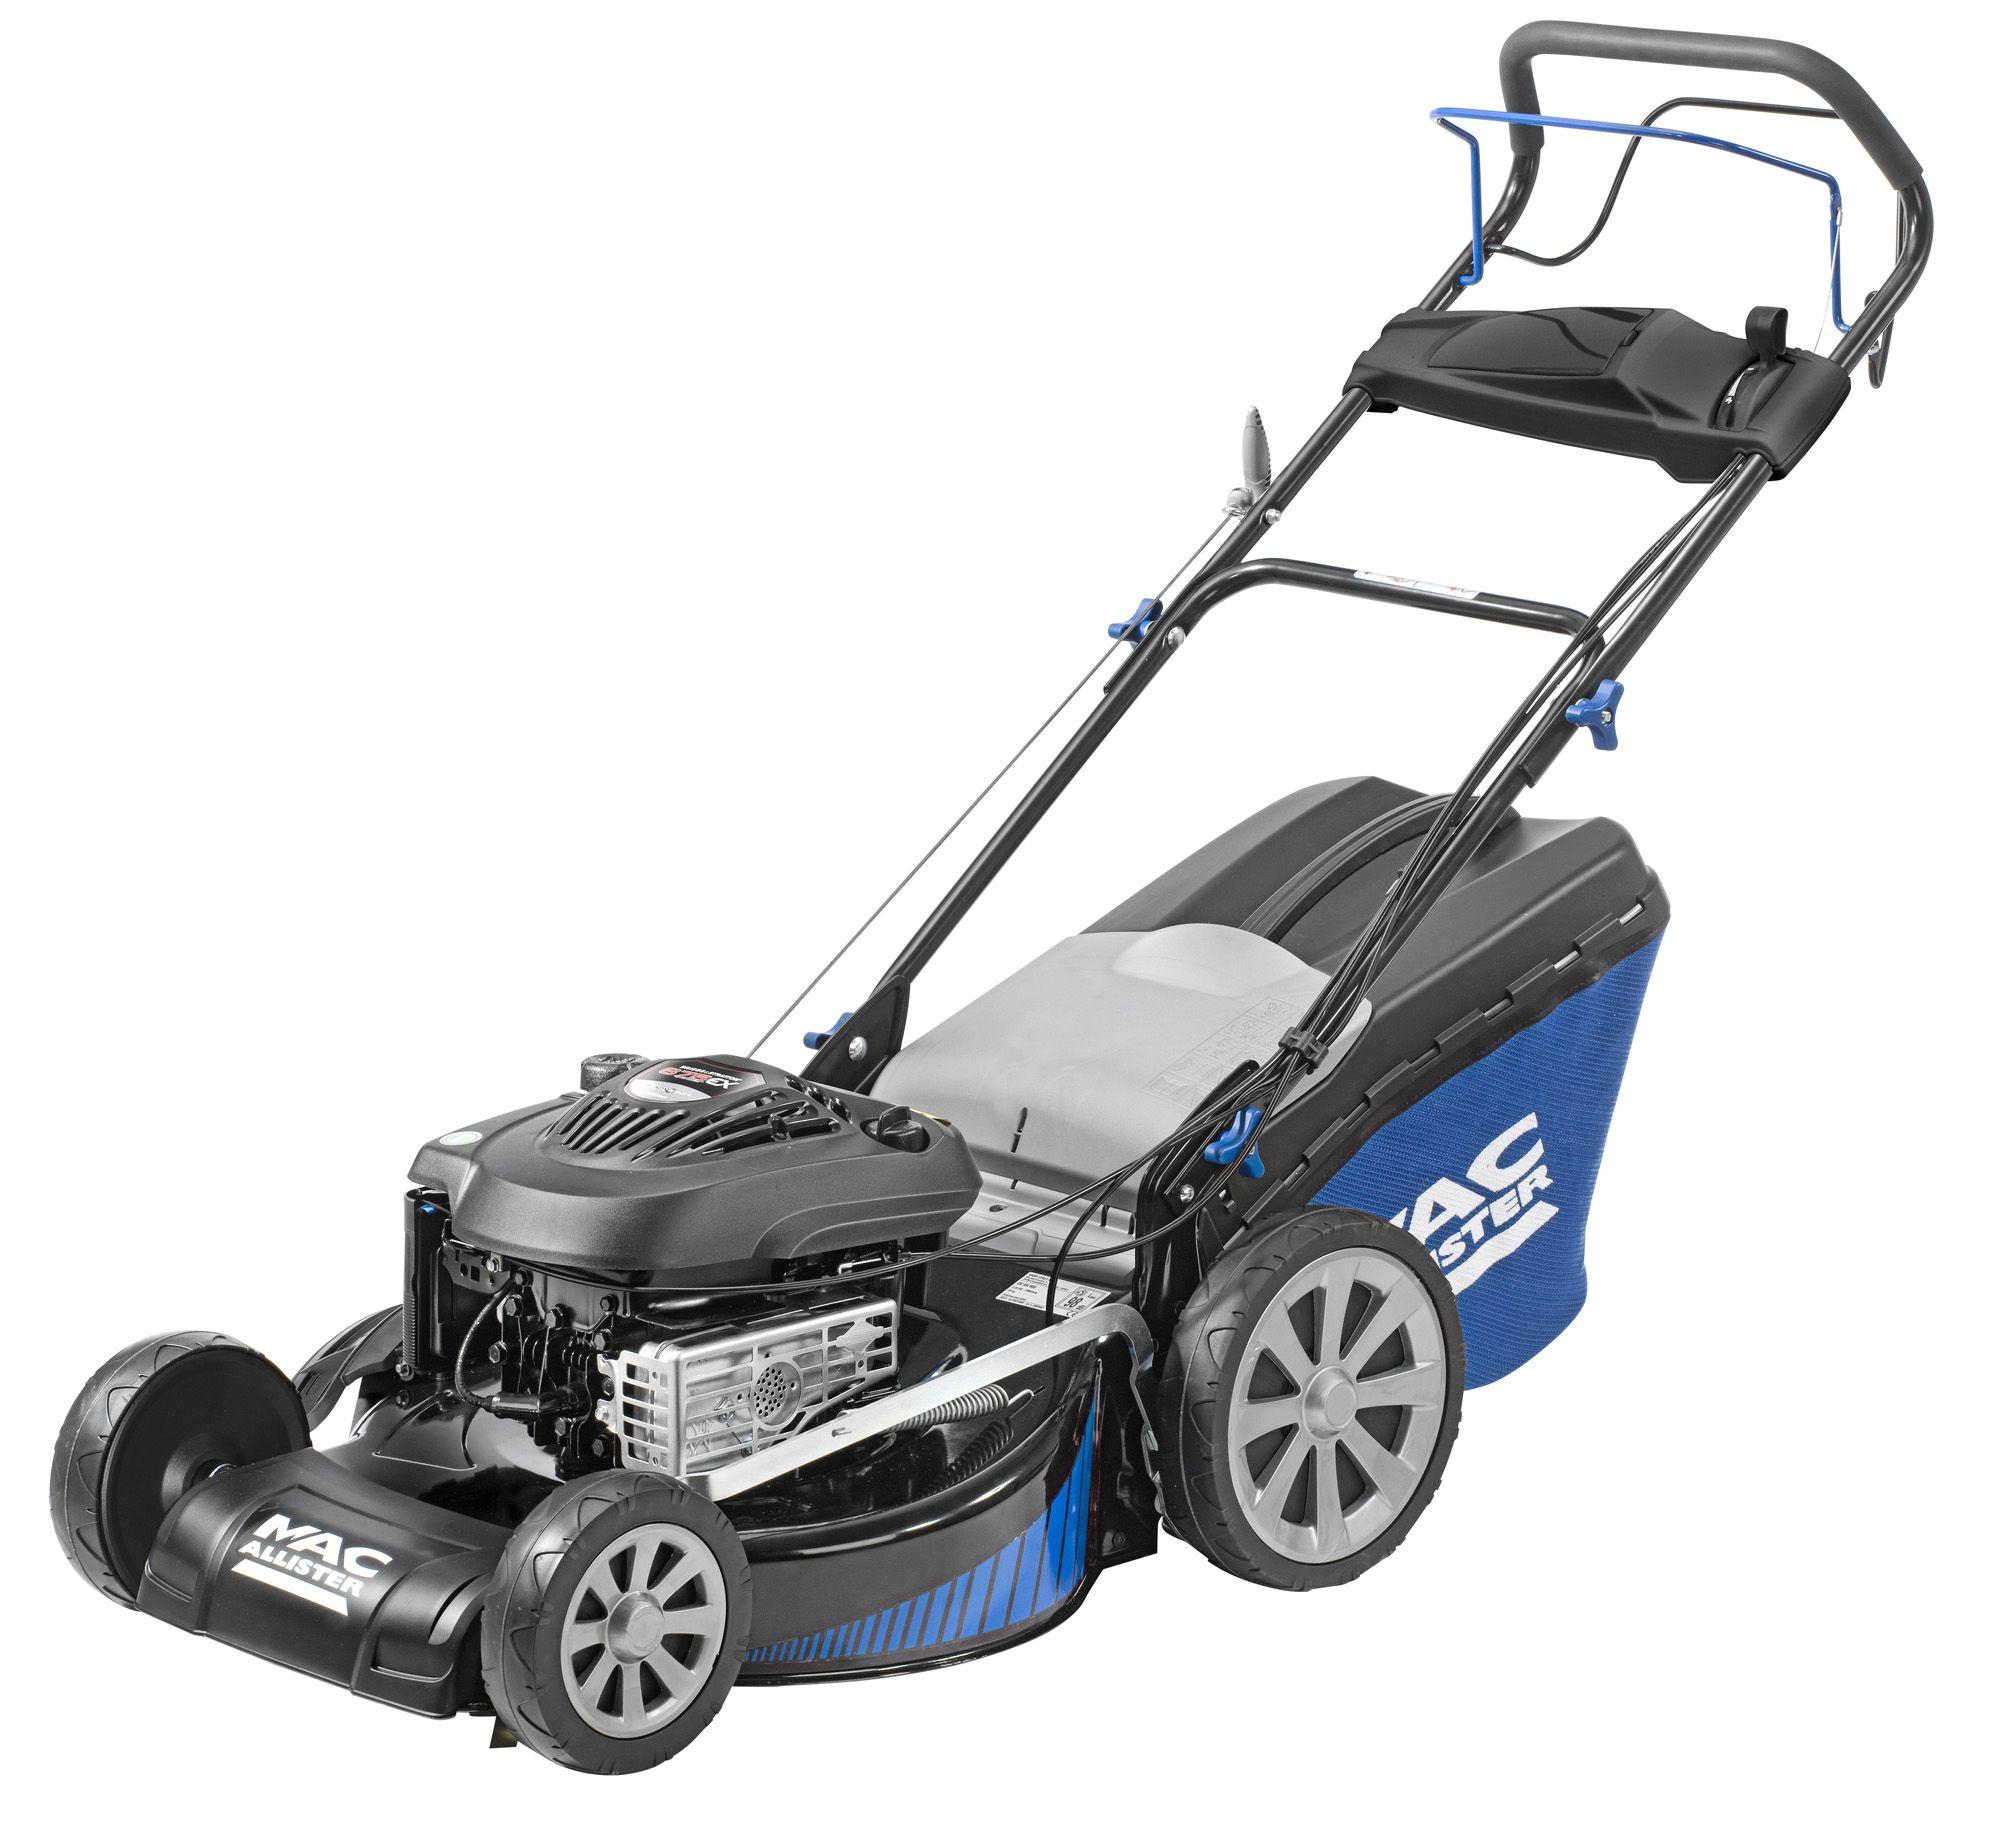 Mac Allister Mprm 53sp Petrol Lawnmower Departments